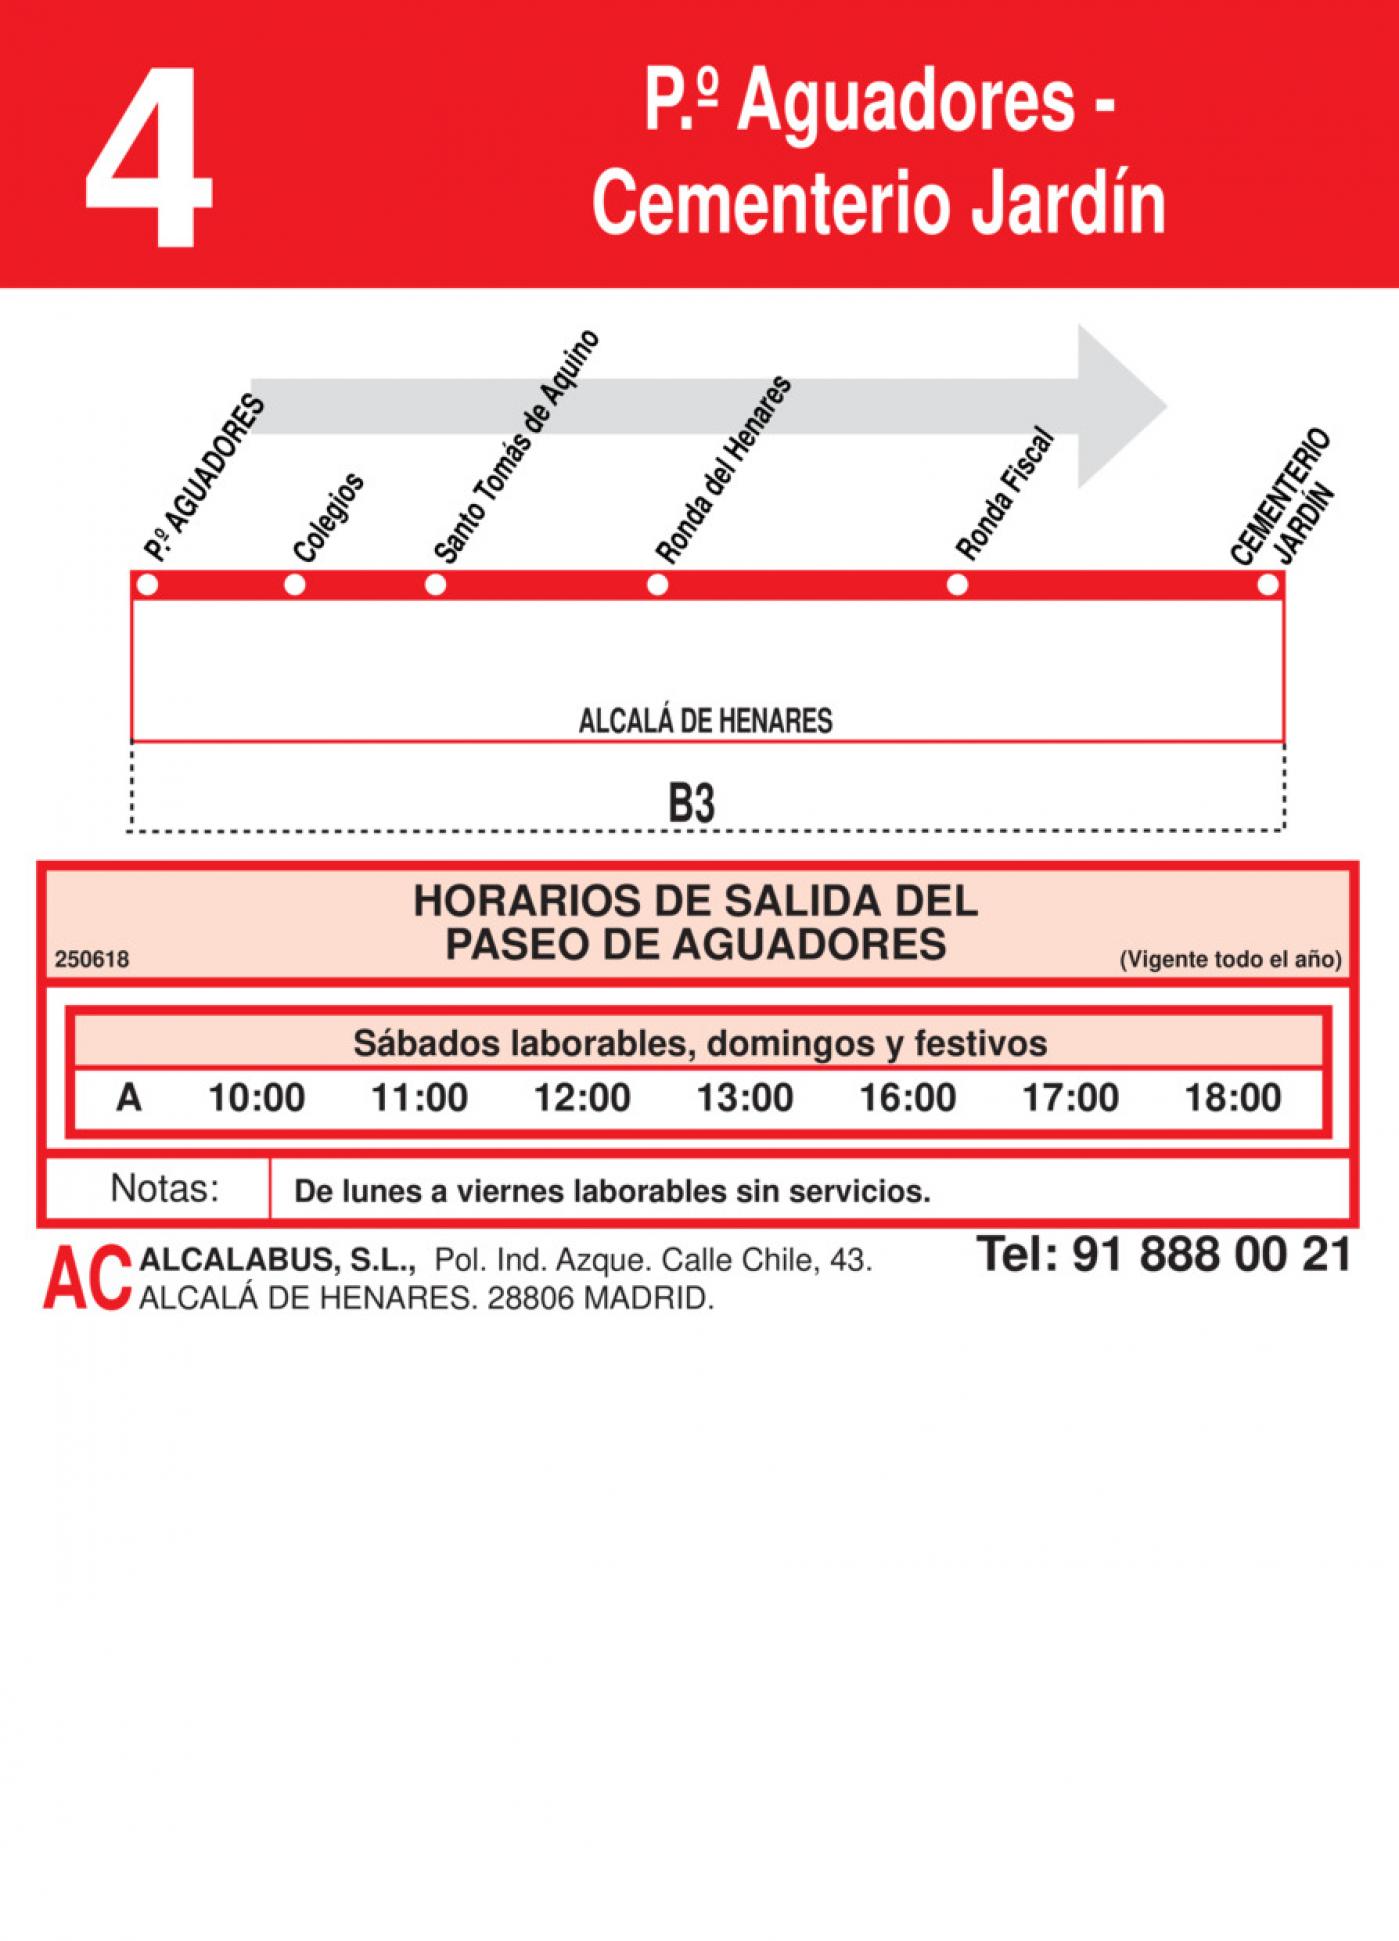 Horarios de autob s l 4 de alcal de henares for Tanatorio jardin alcala de henares